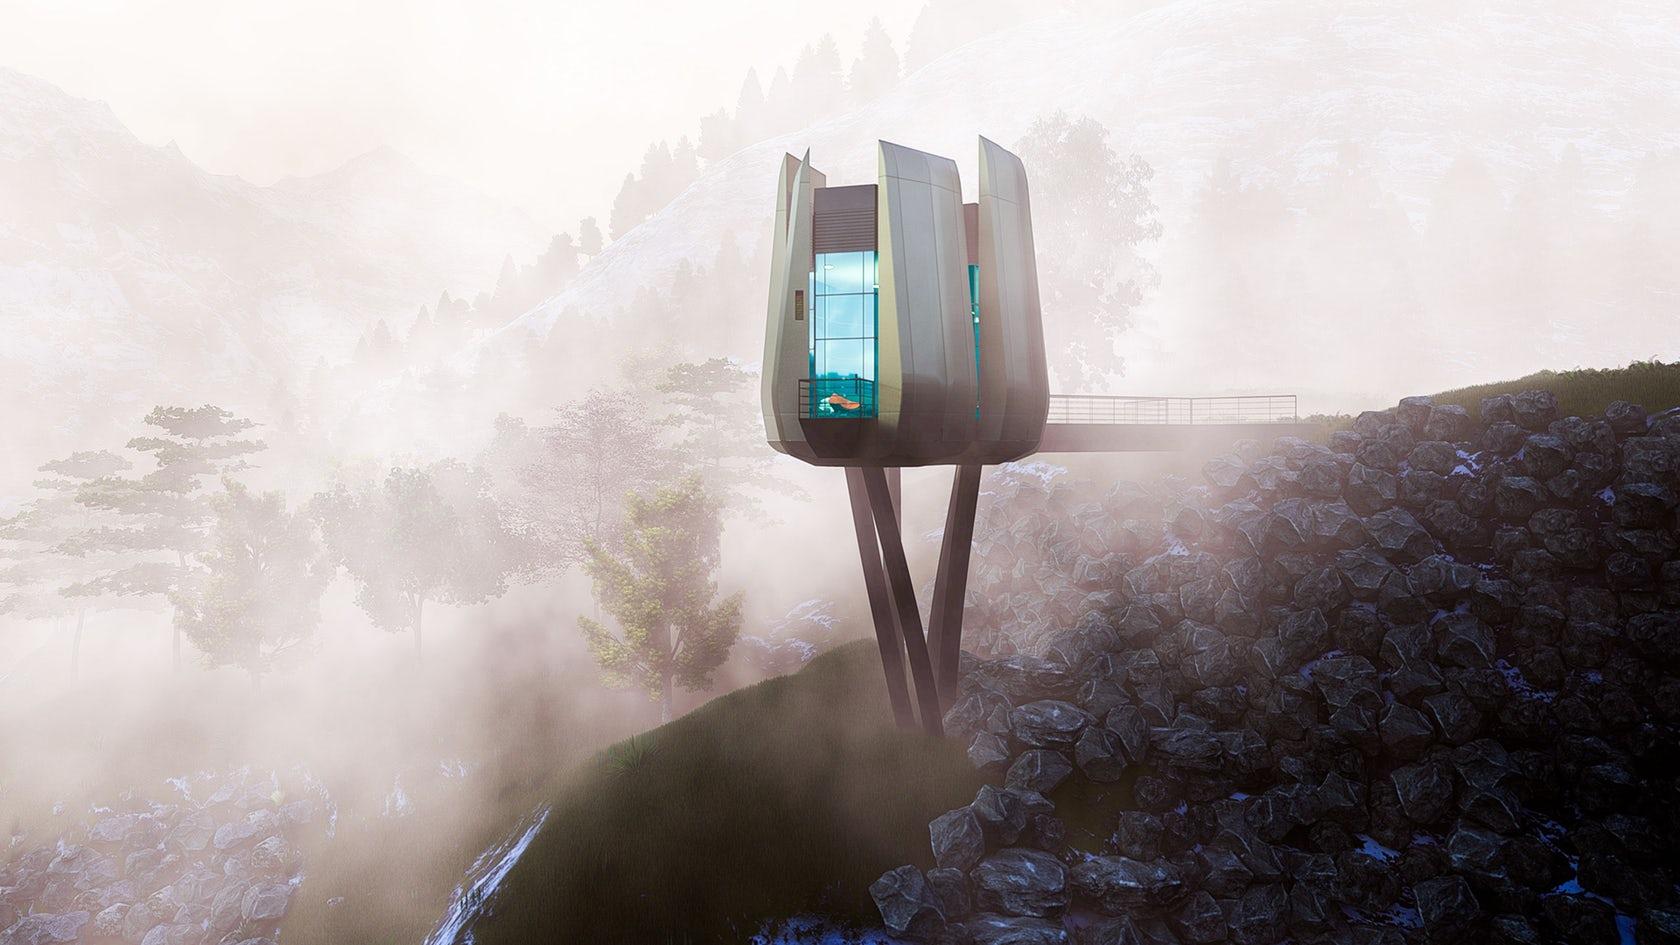 Futuristic Sustainable Mountain Pod By EA-Lab